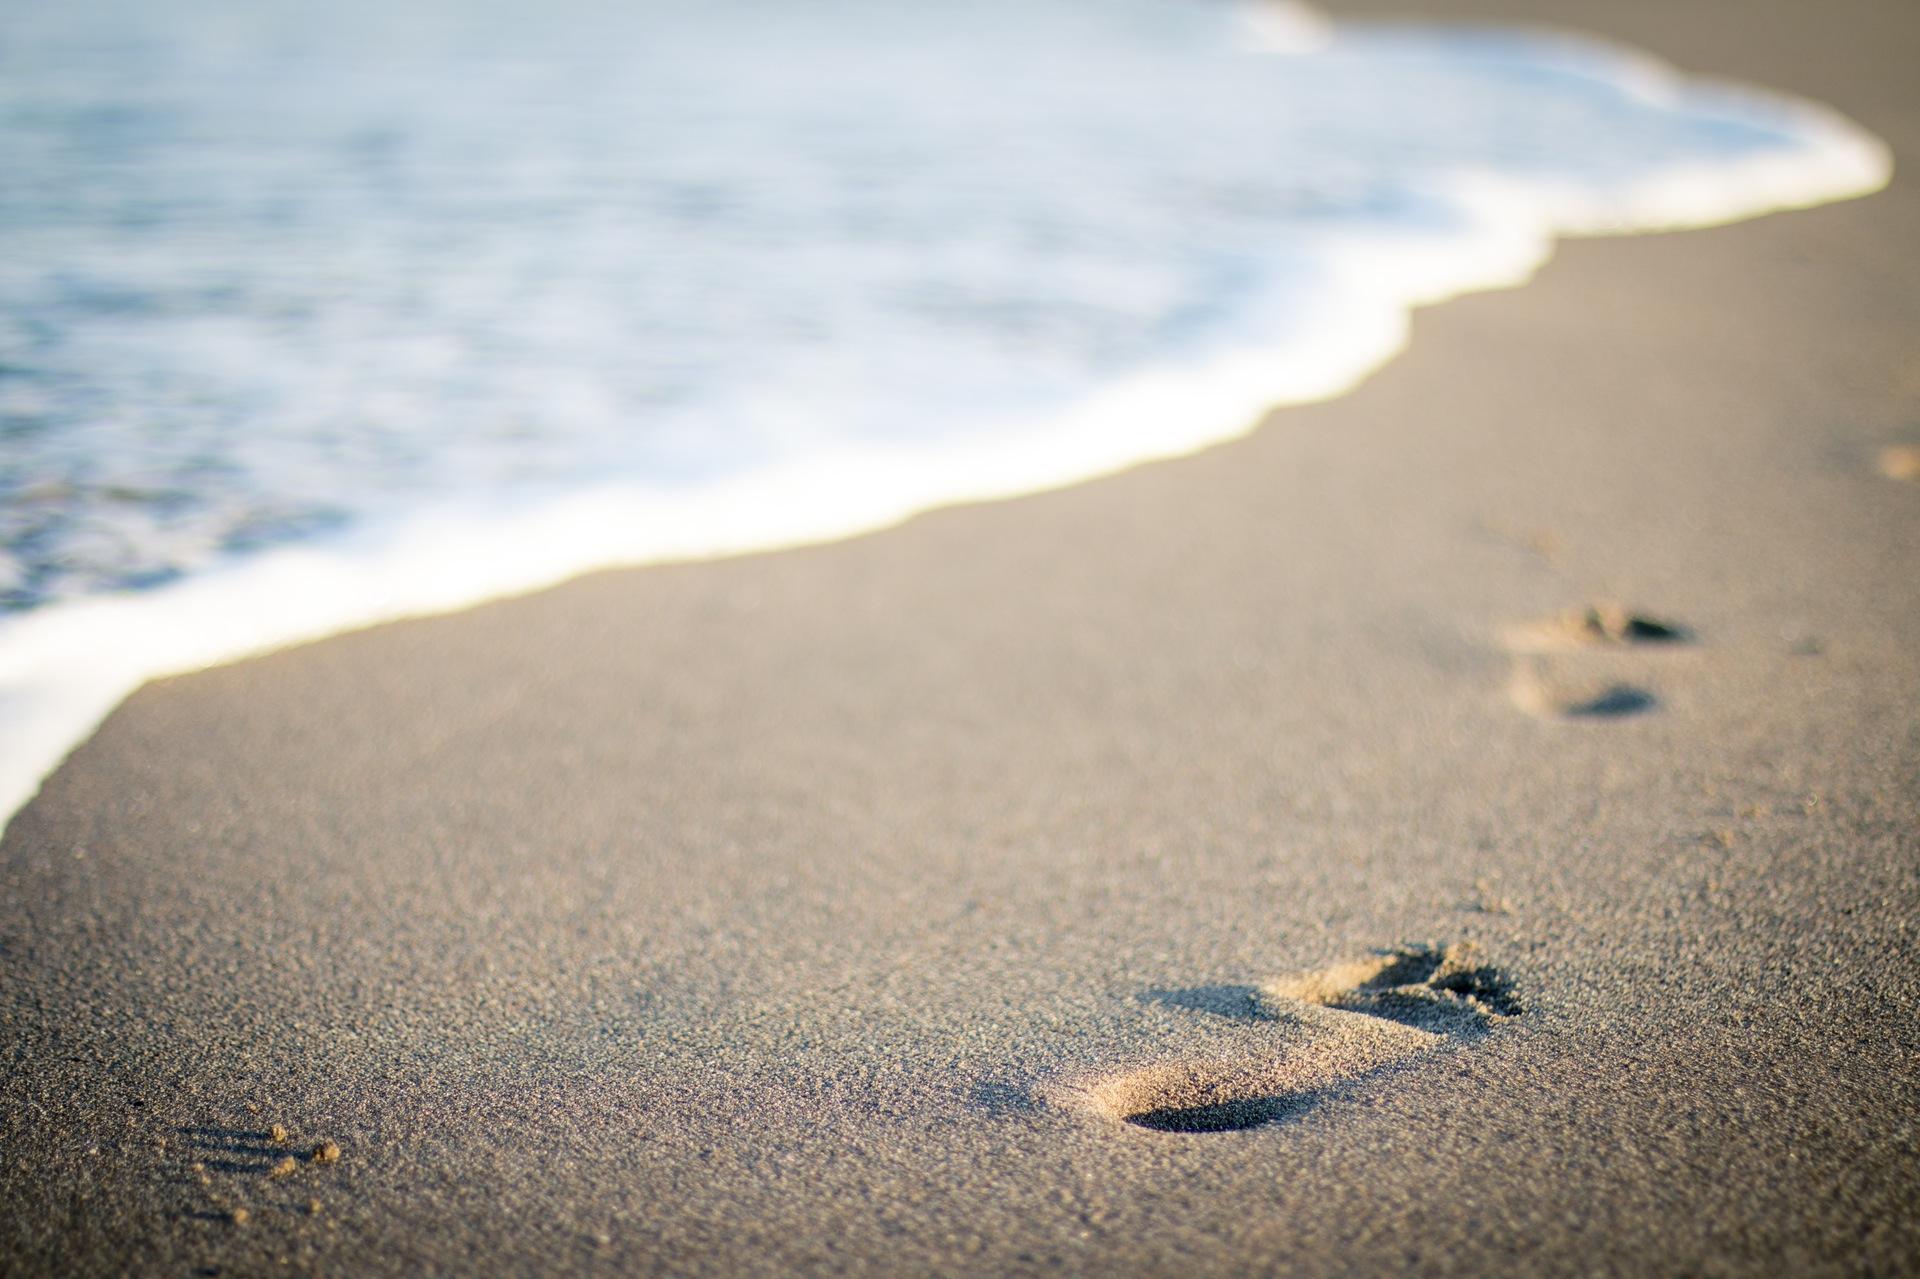 Strand, Sand, Fußabdrücke, Sommer, Urlaub, Meer, Wellen - Wallpaper HD - Prof.-falken.com